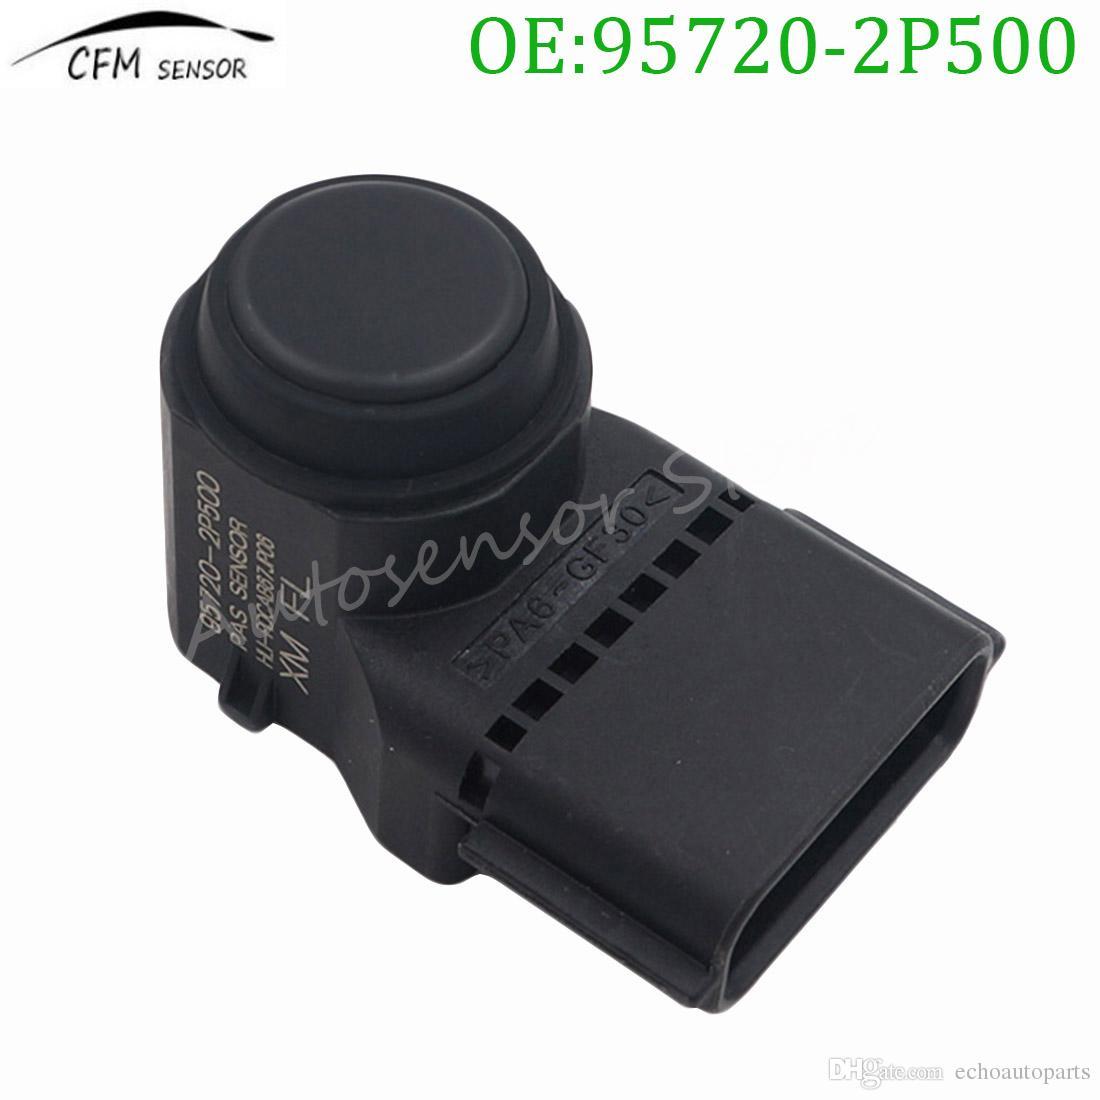 2018 high quality 95720 2p500 car pdc parking sensor for 2014 2015